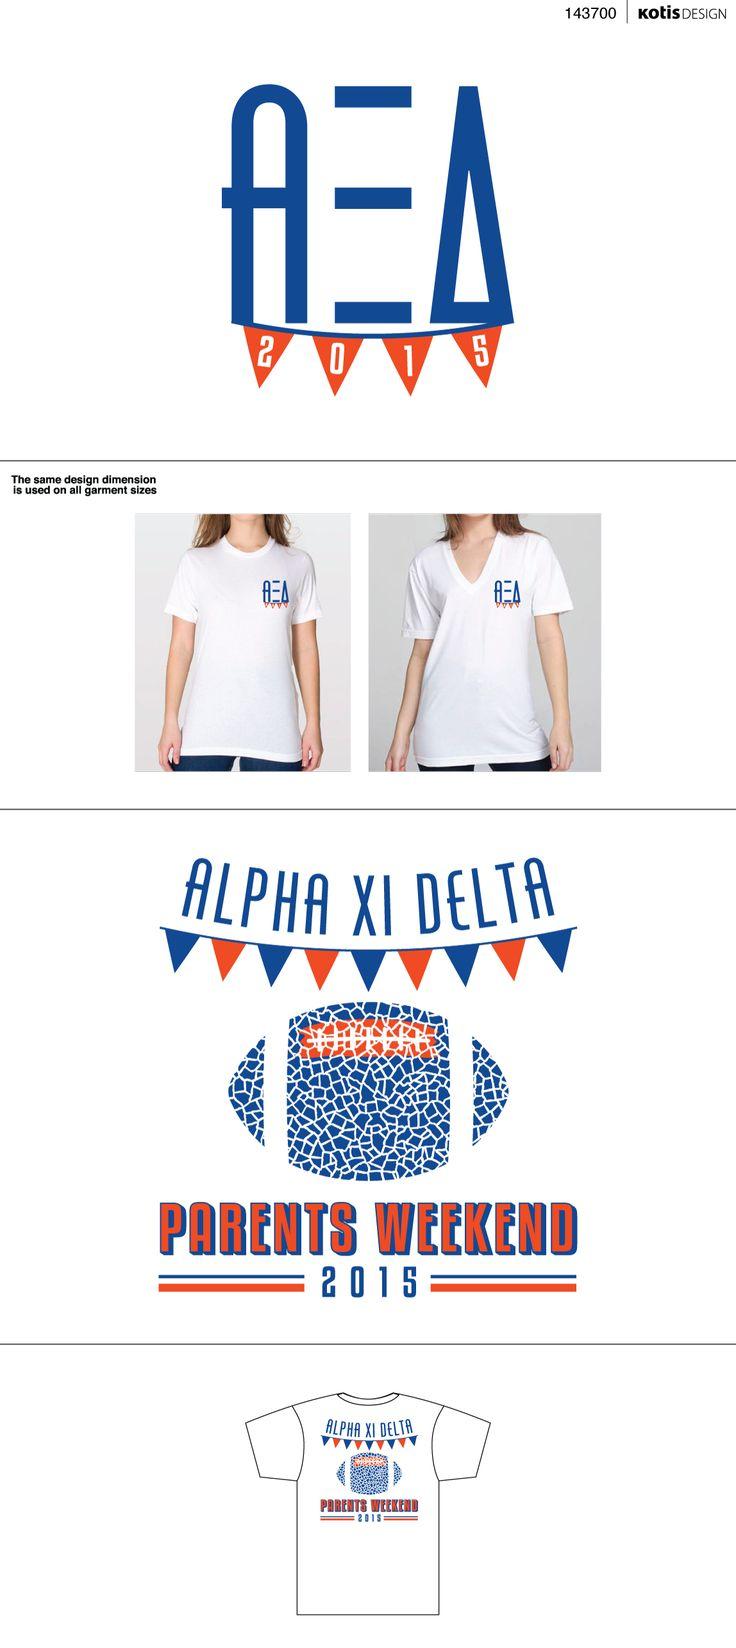 143700 - BSU AXiD | Parent's Weekend Shirts '15 - View Proof - Kotis Design